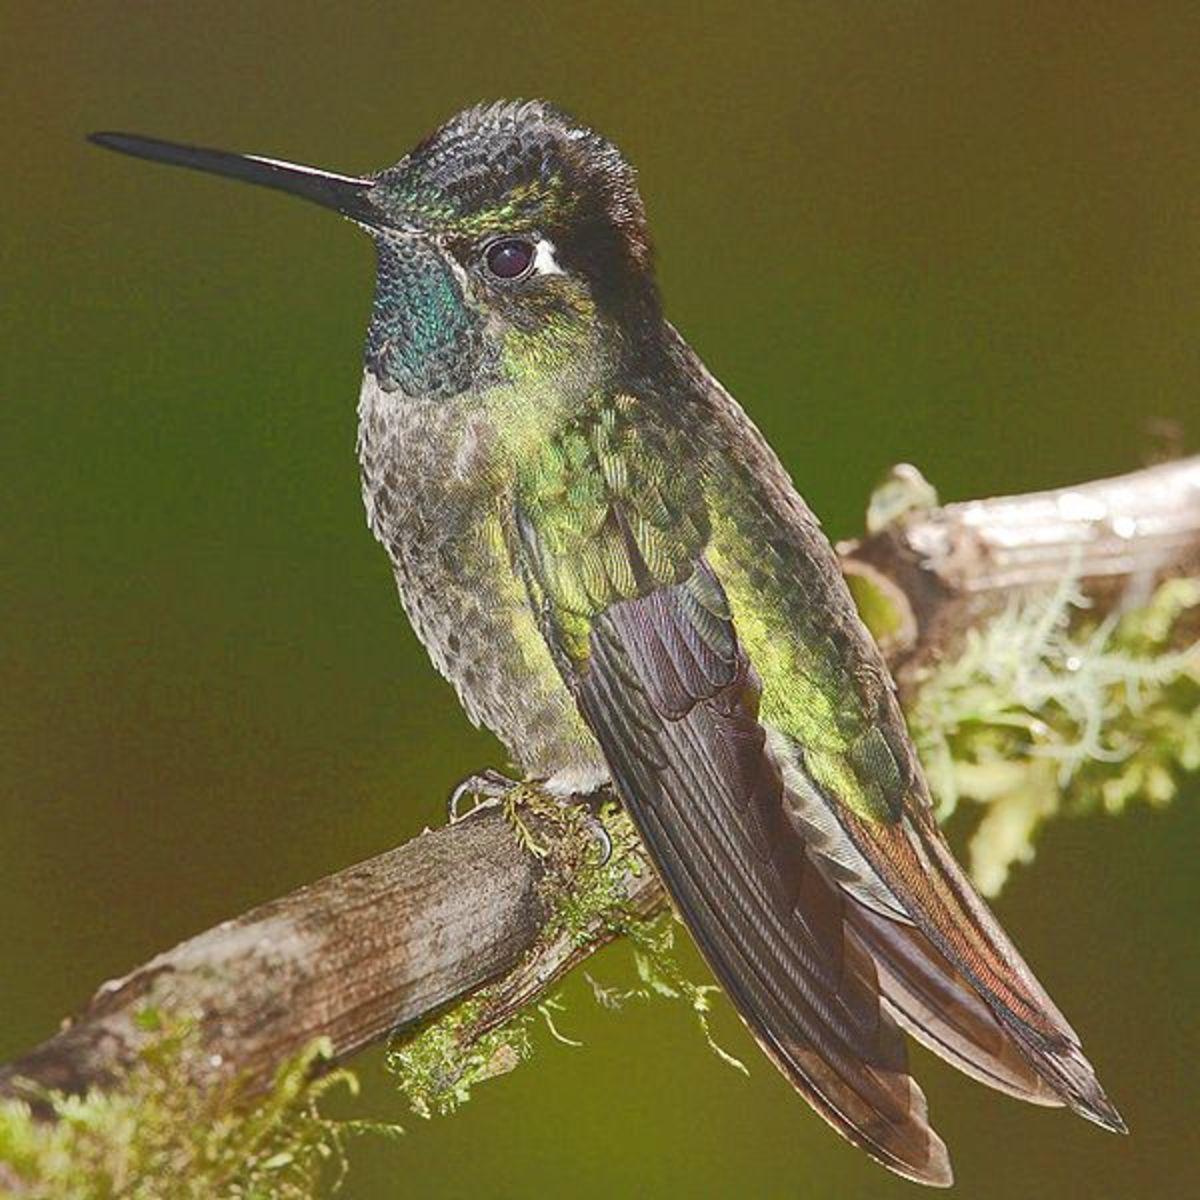 Different species of humming birds: Magnificent Hummingbird